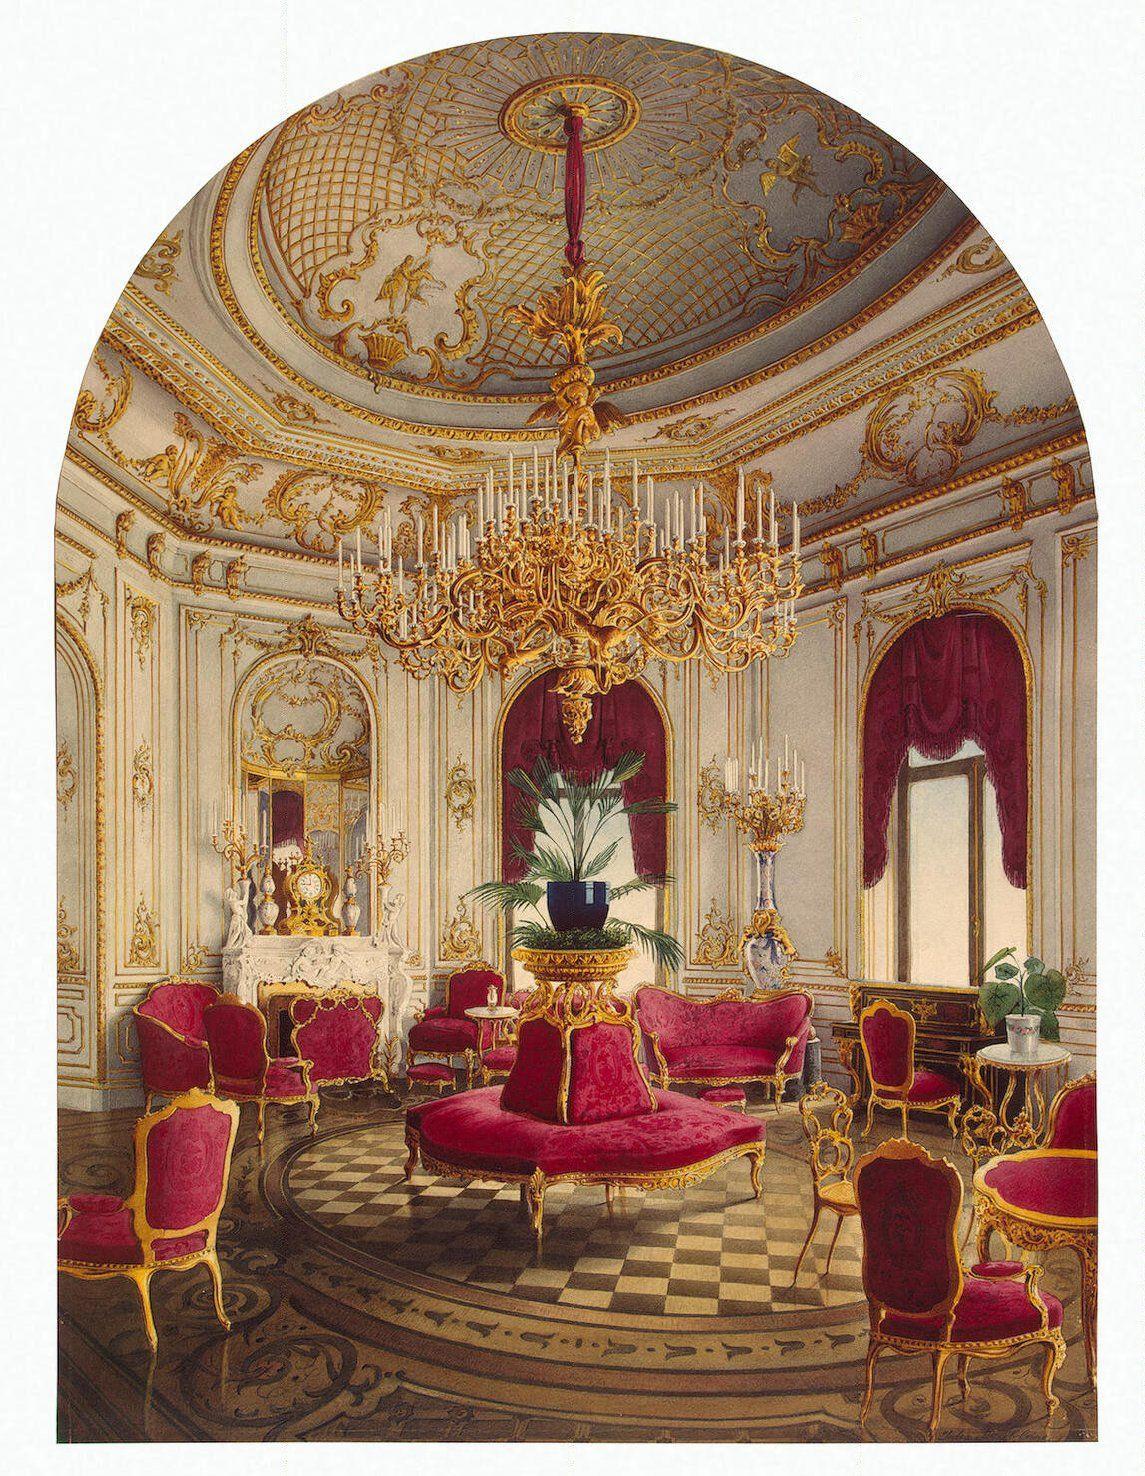 Inside the palace of count stroganov saint petersburg - Appartement reve saint petersbourg anton valiev ...